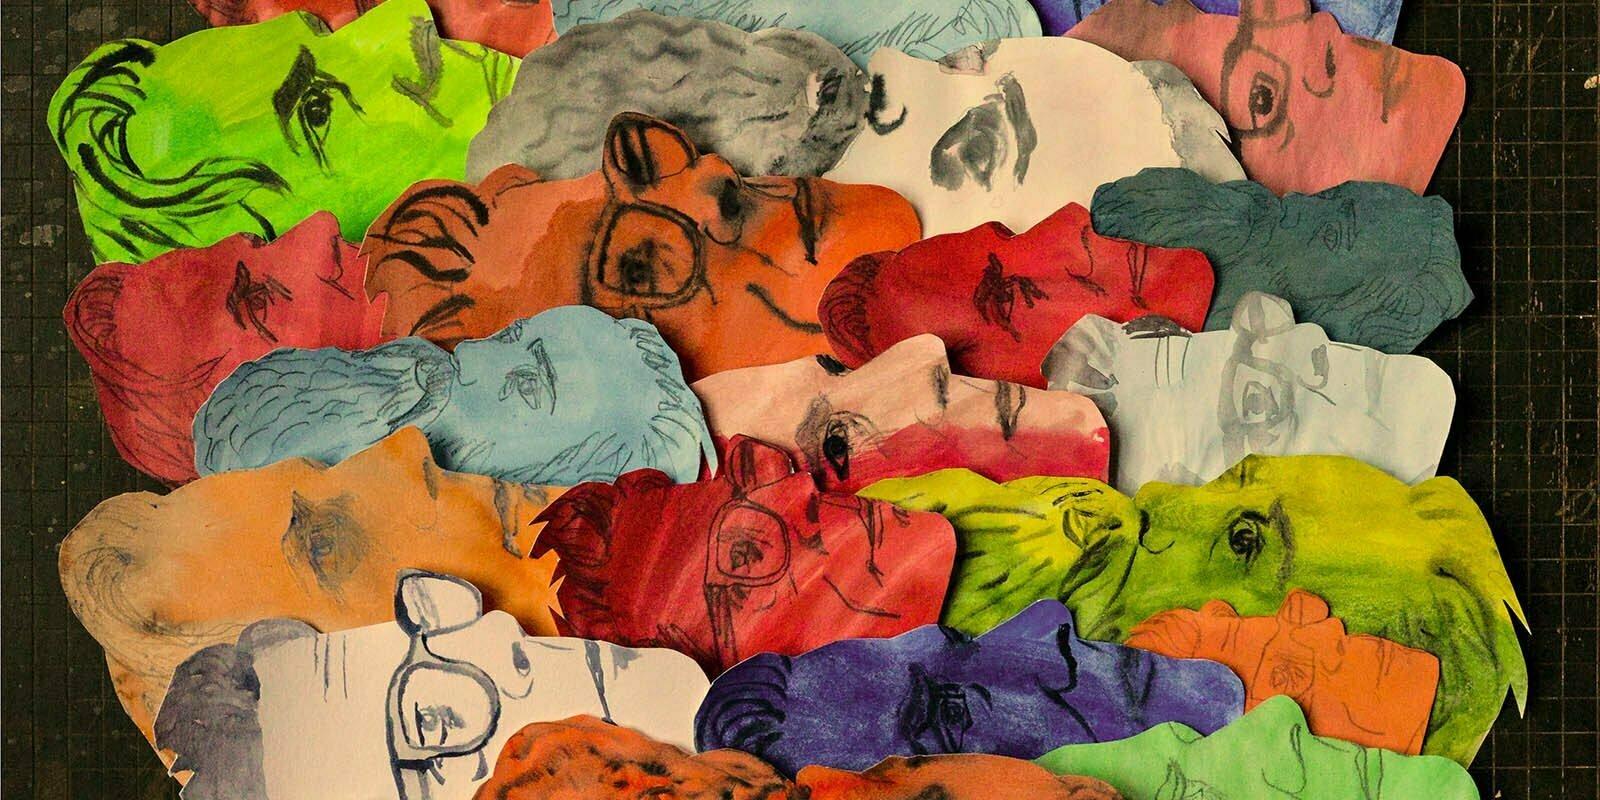 Discos de junio - CALEXICO (IRON & WINE) – Years to burn